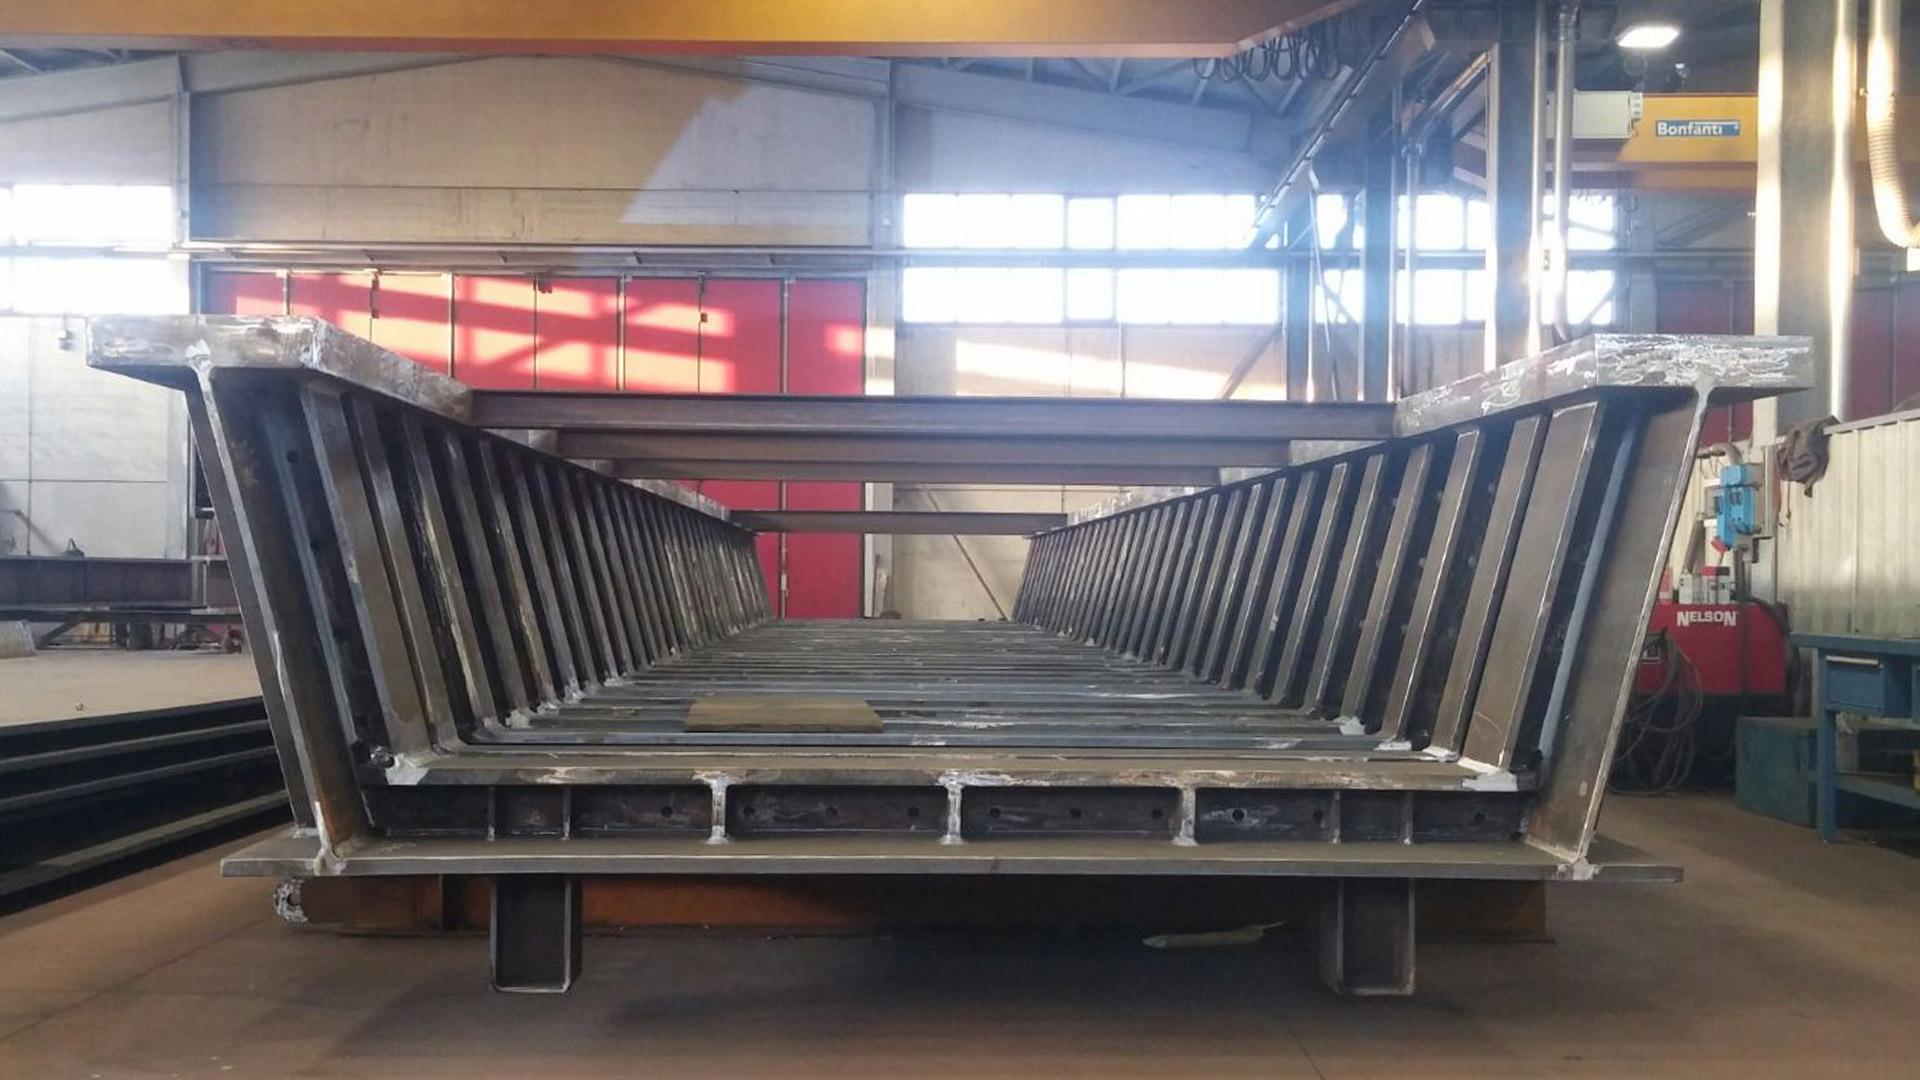 rio-borghetto-ponte-vista-frontale-2-carpenteria-civile-metal-engineering